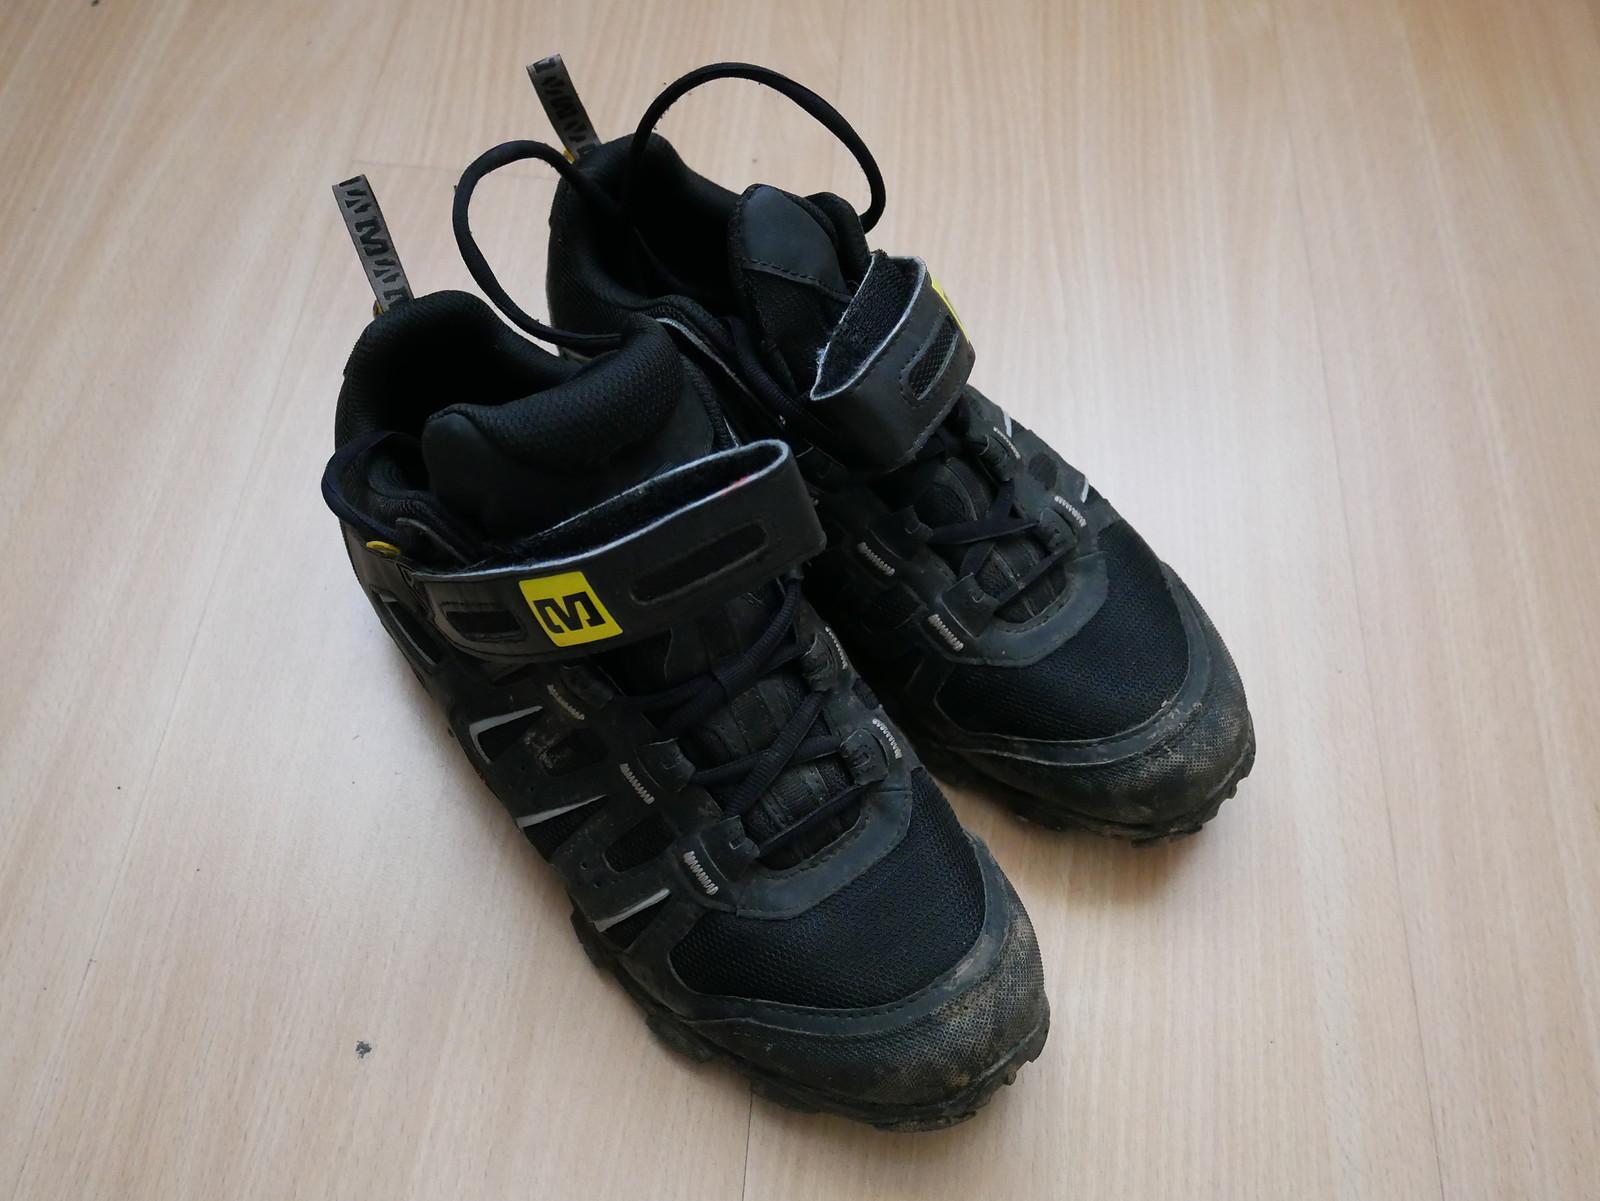 25311b24227bb1 Mavic Alpine Klickpedalschuhe - Gr. 43 1 3 bzw. 9 - AM Schuhe ...